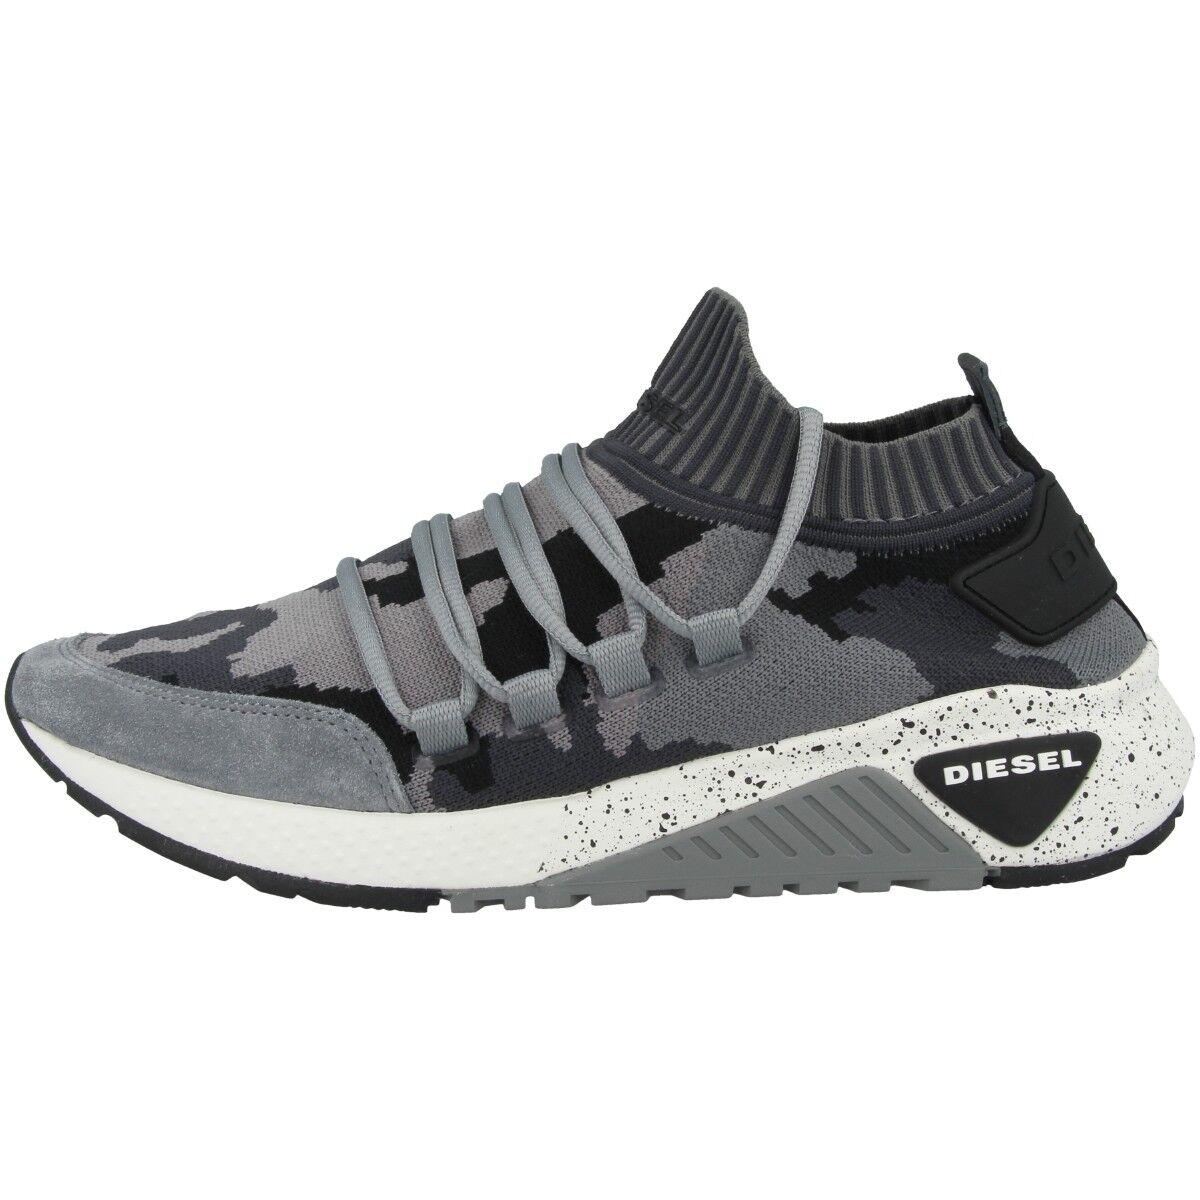 Diesel S-KB Sl shoes Low Cut Leisure Trainers Y01917-P2166-H7196